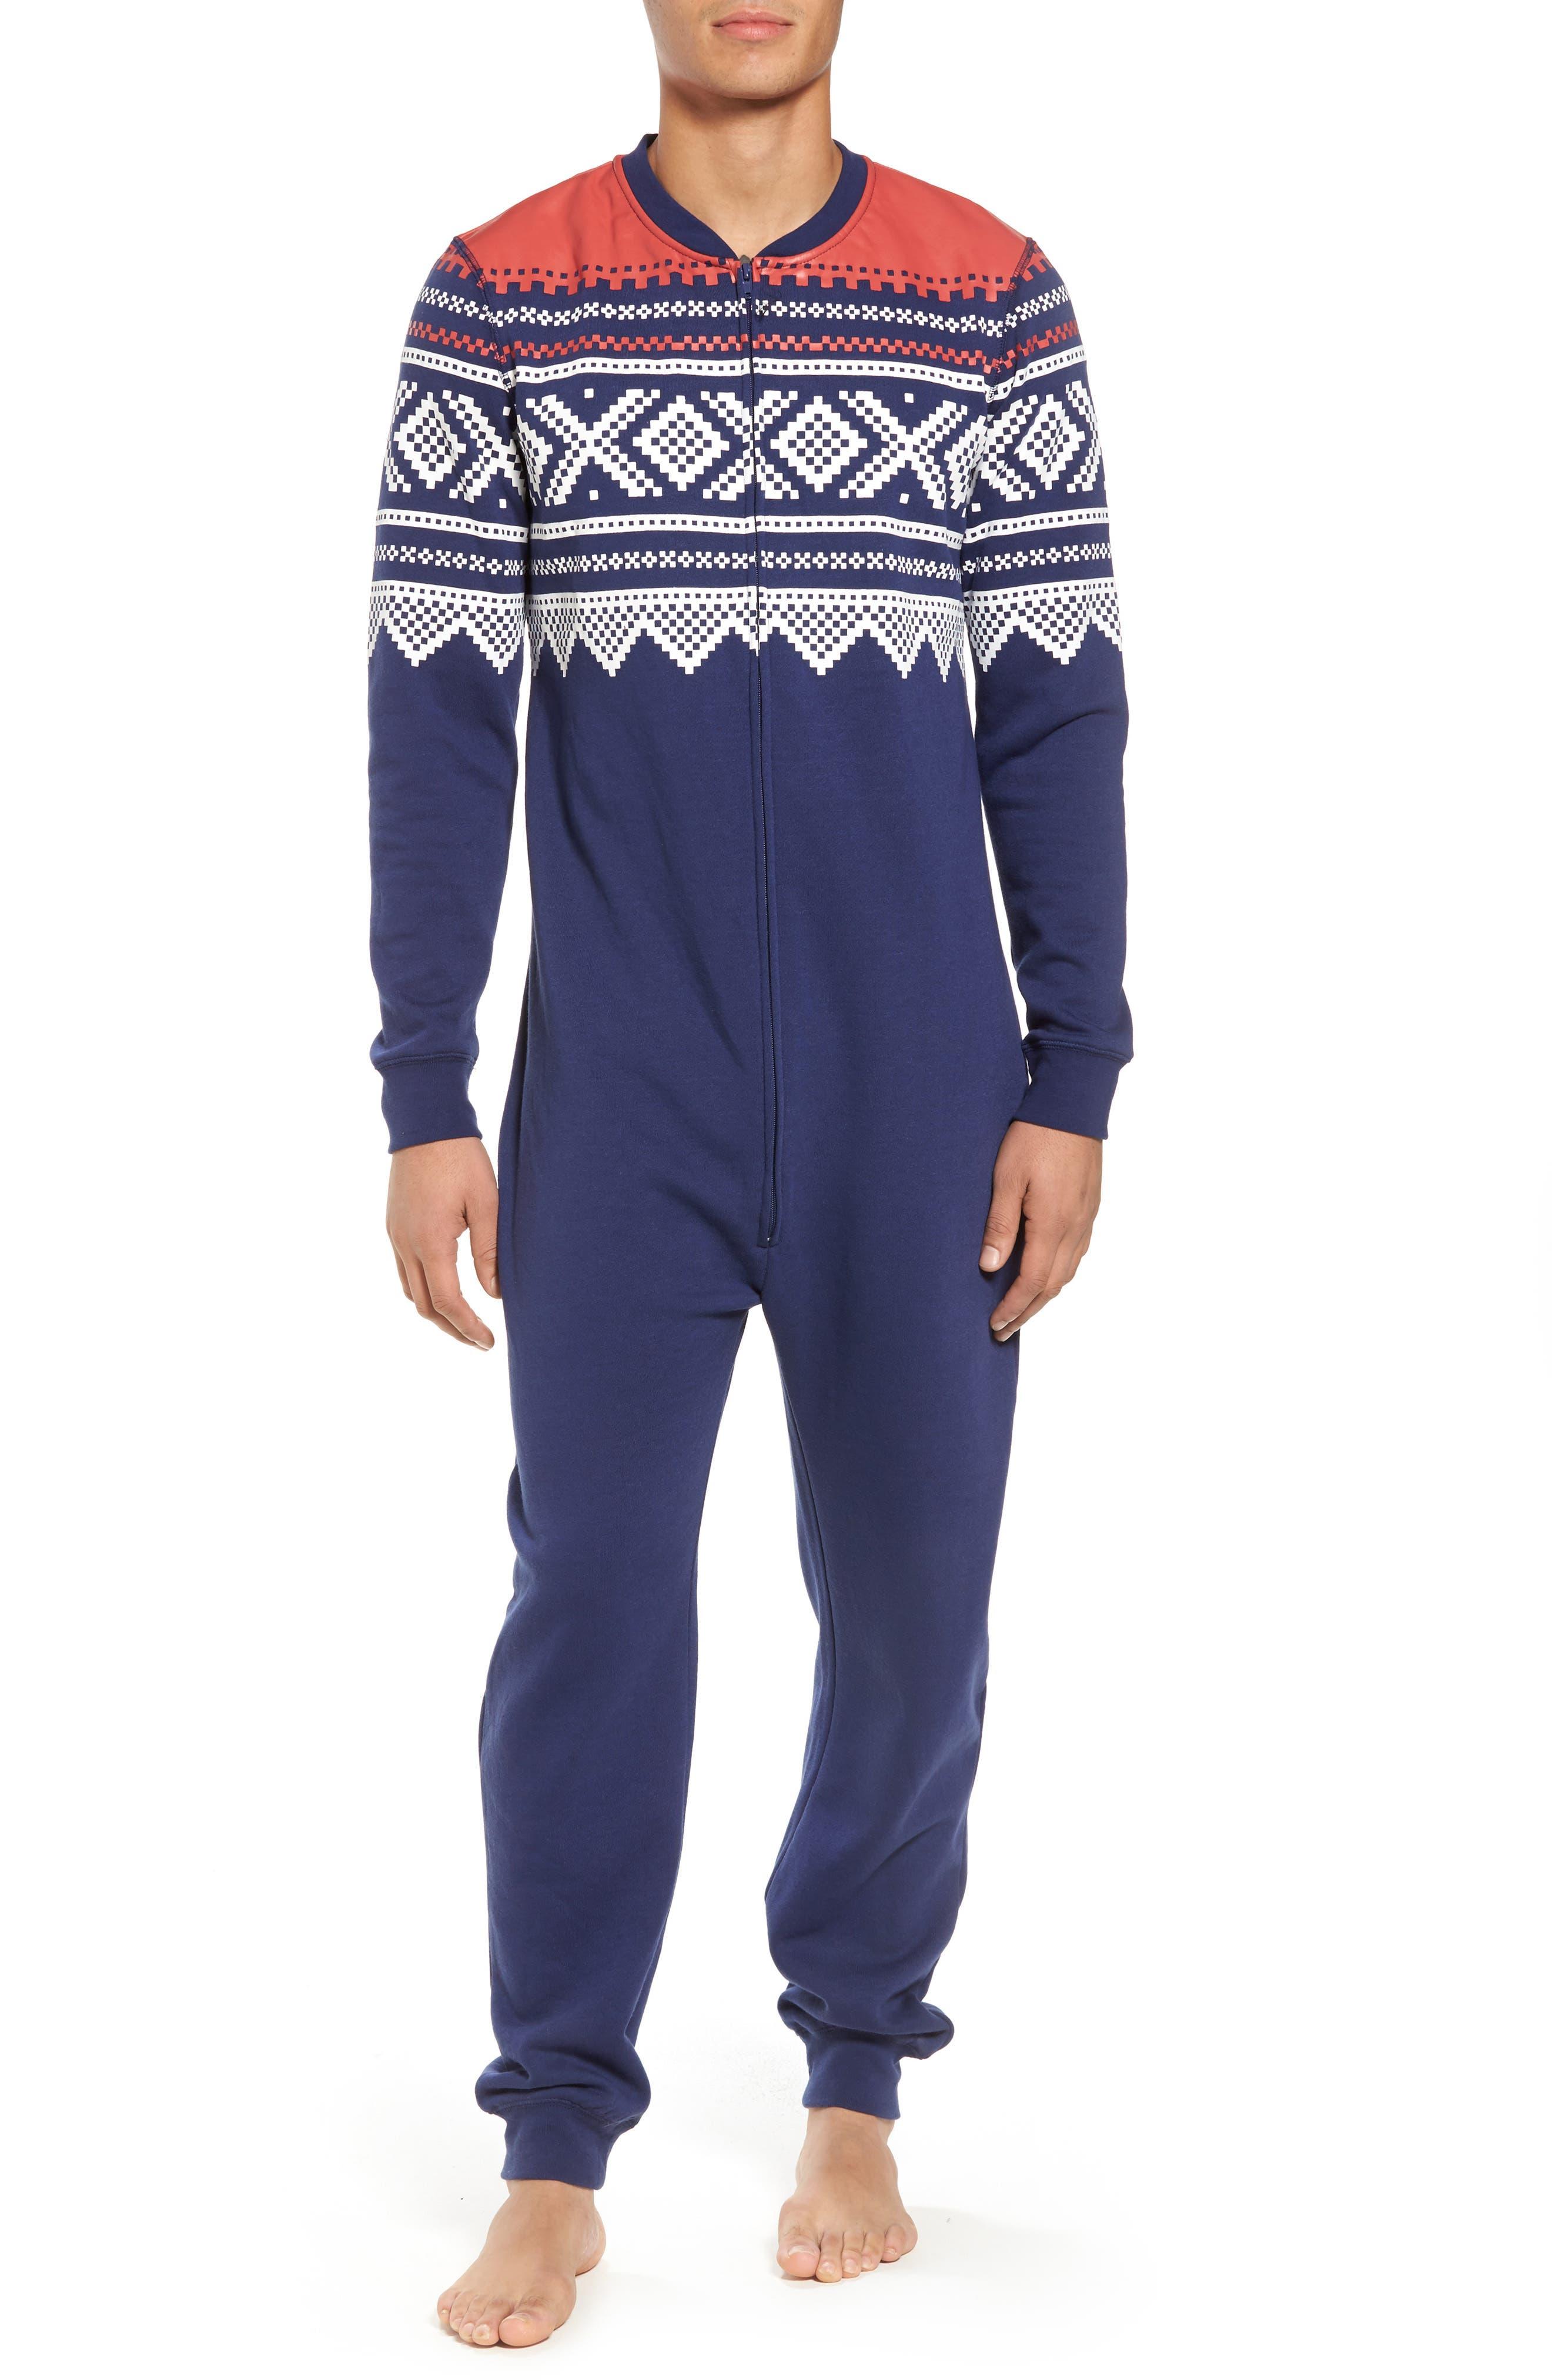 Fleece One-Piece Pajamas,                             Main thumbnail 1, color,                             040